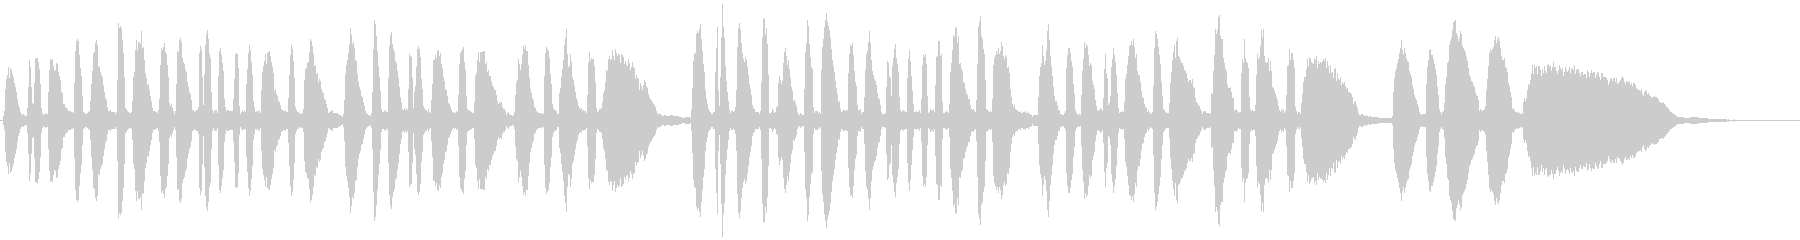 [Raw] Brass = Gentle fanfare's unreproduced waveform